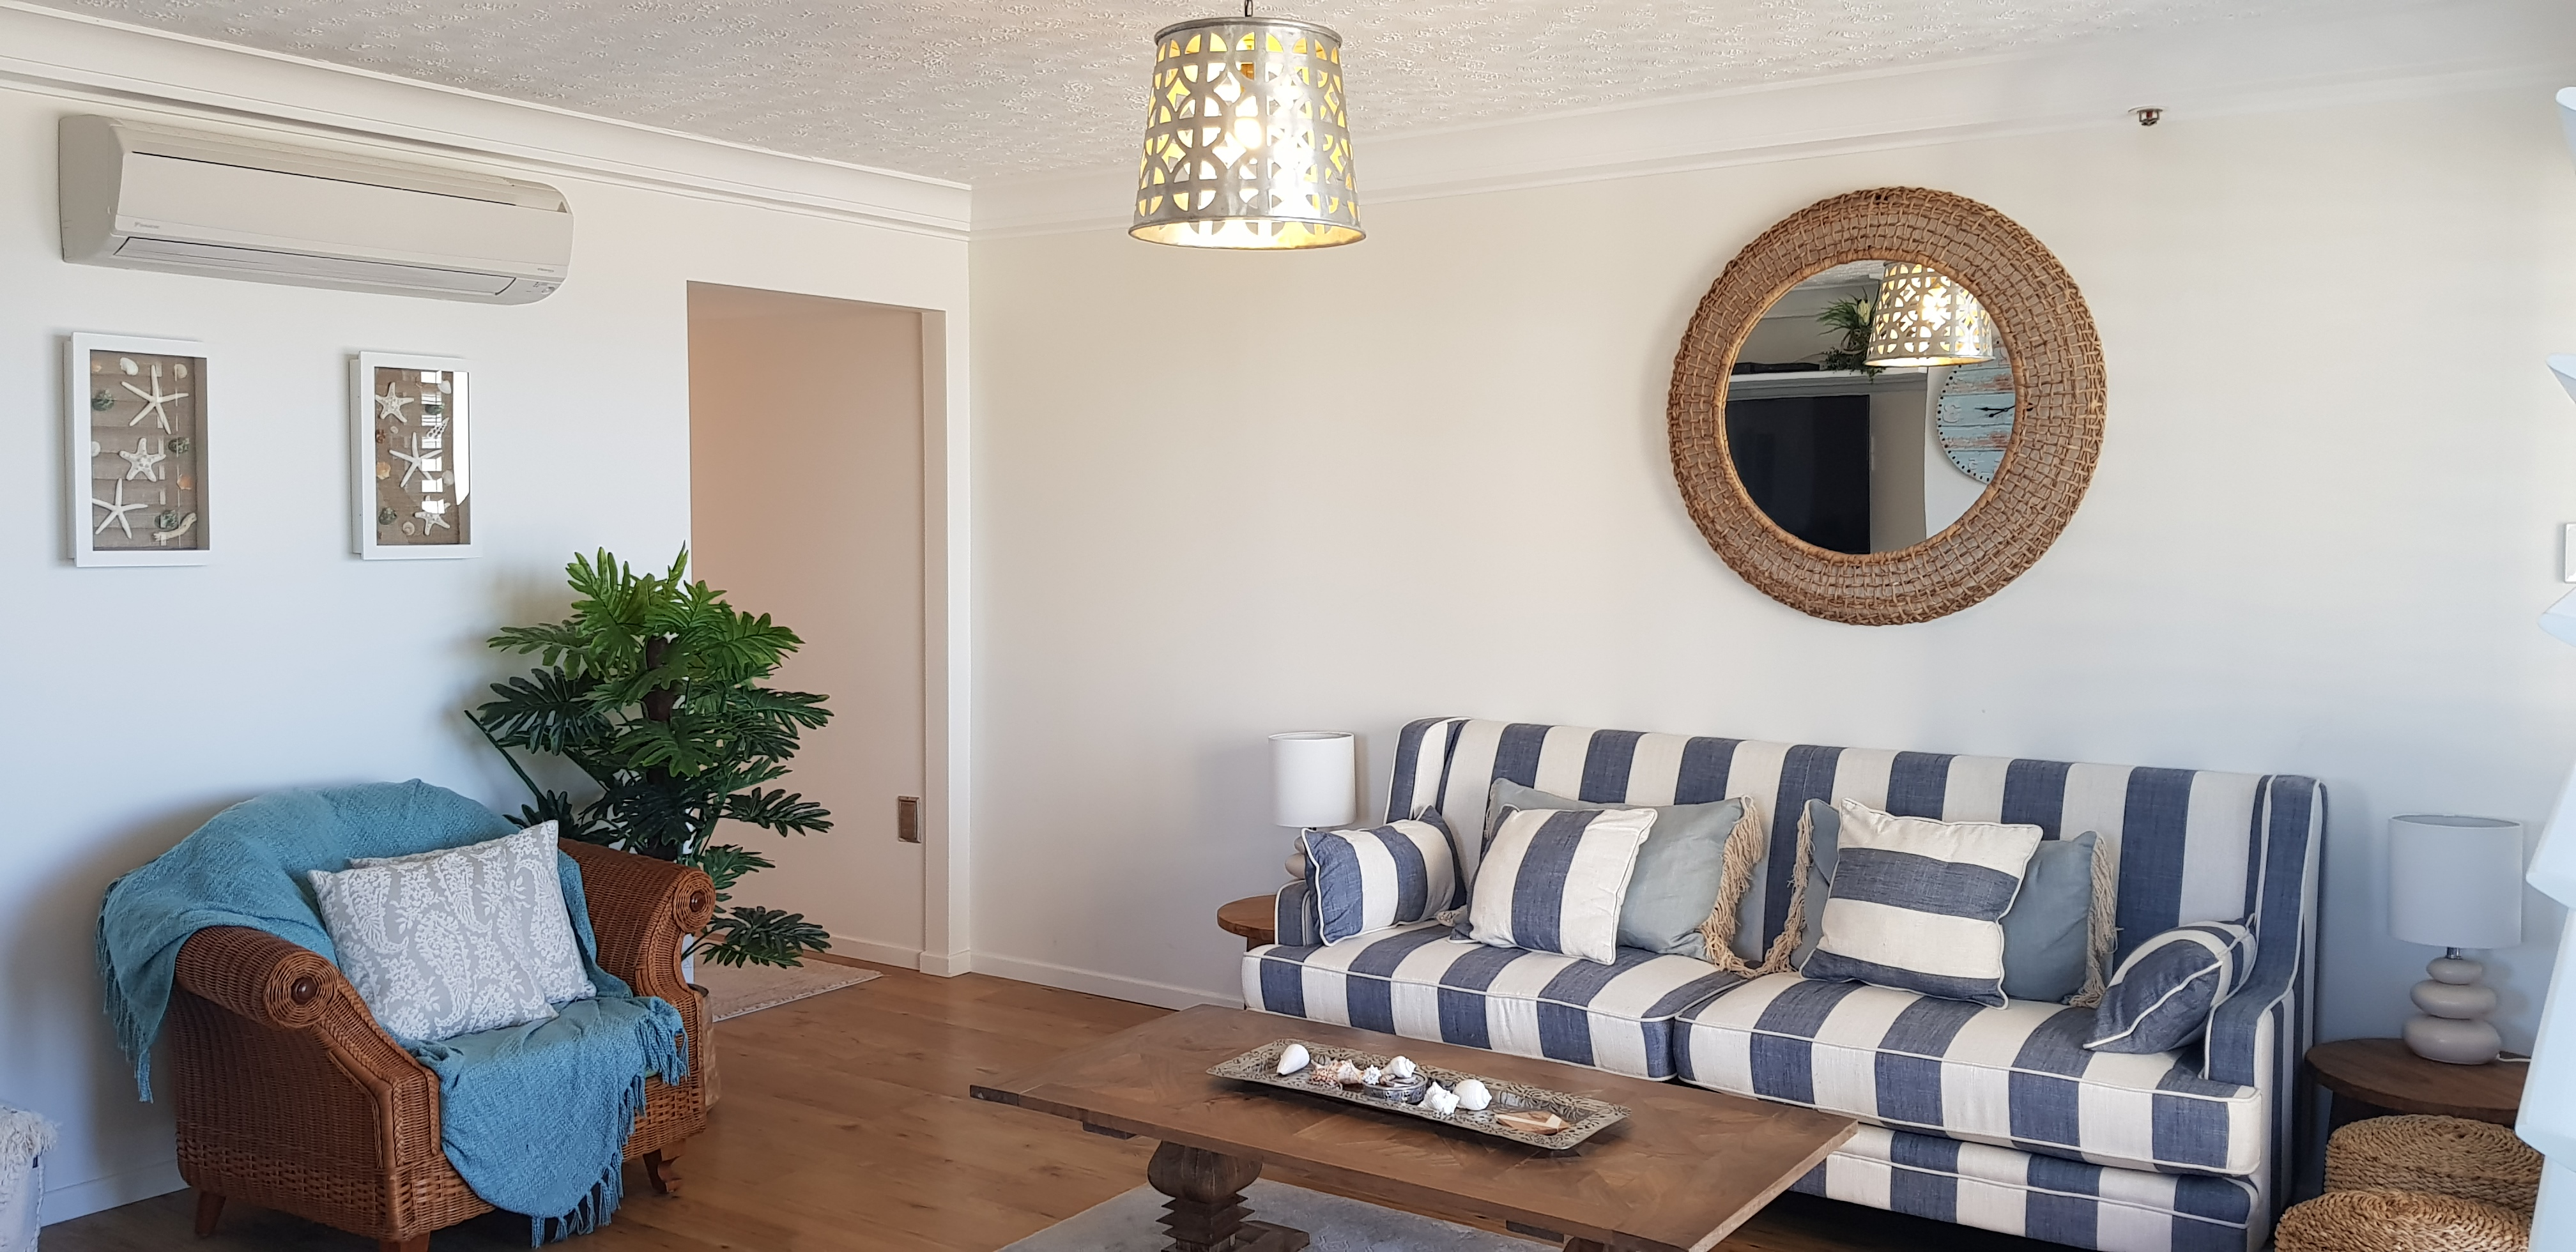 Royal Palm Resort Accommodation Lounge Room